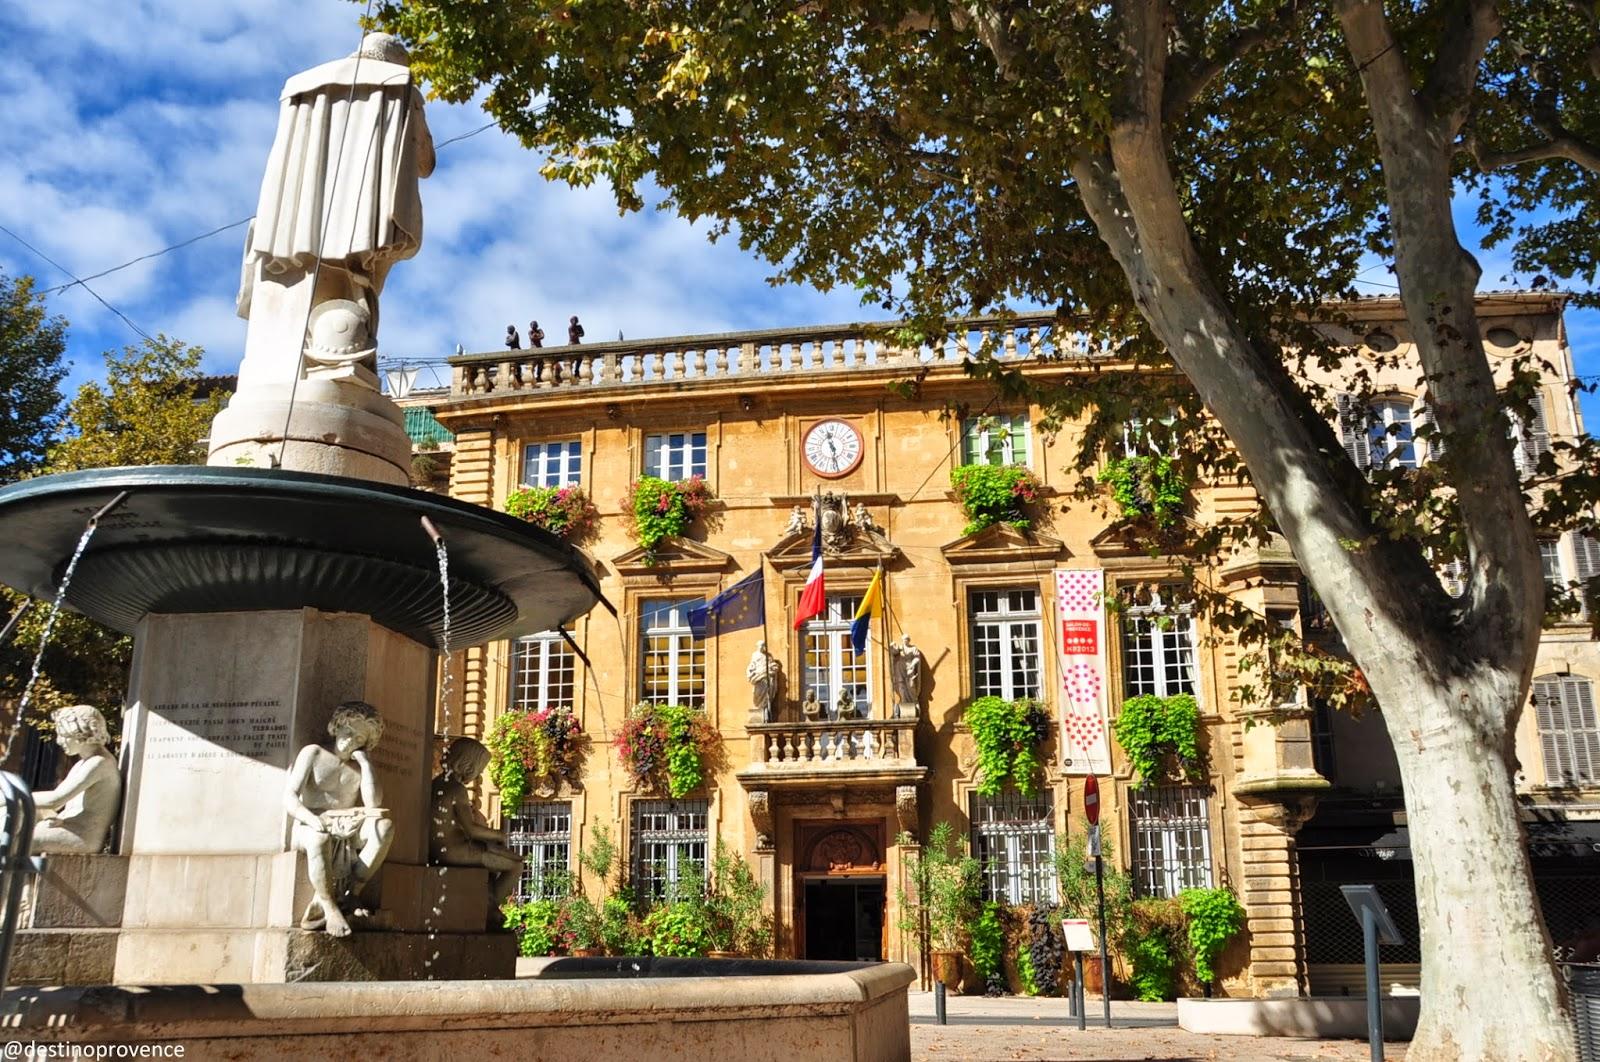 Destino provence as atra es de salon de provence castelo medieval nostradamus e avi es - Hotel bb salon de provence ...